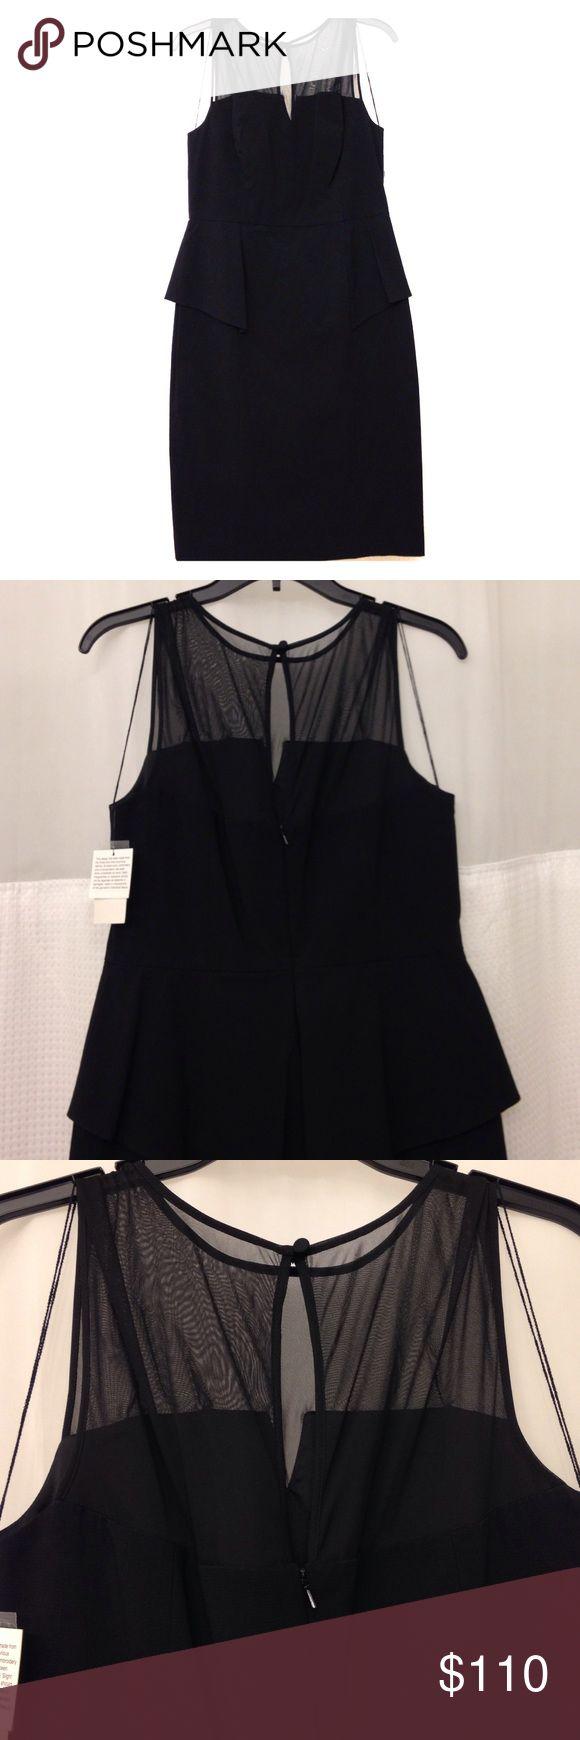 Aidan Mattox dress Black peplum dress with sheer top detail, back zipper, classy! Aidan Mattox Dresses Midi